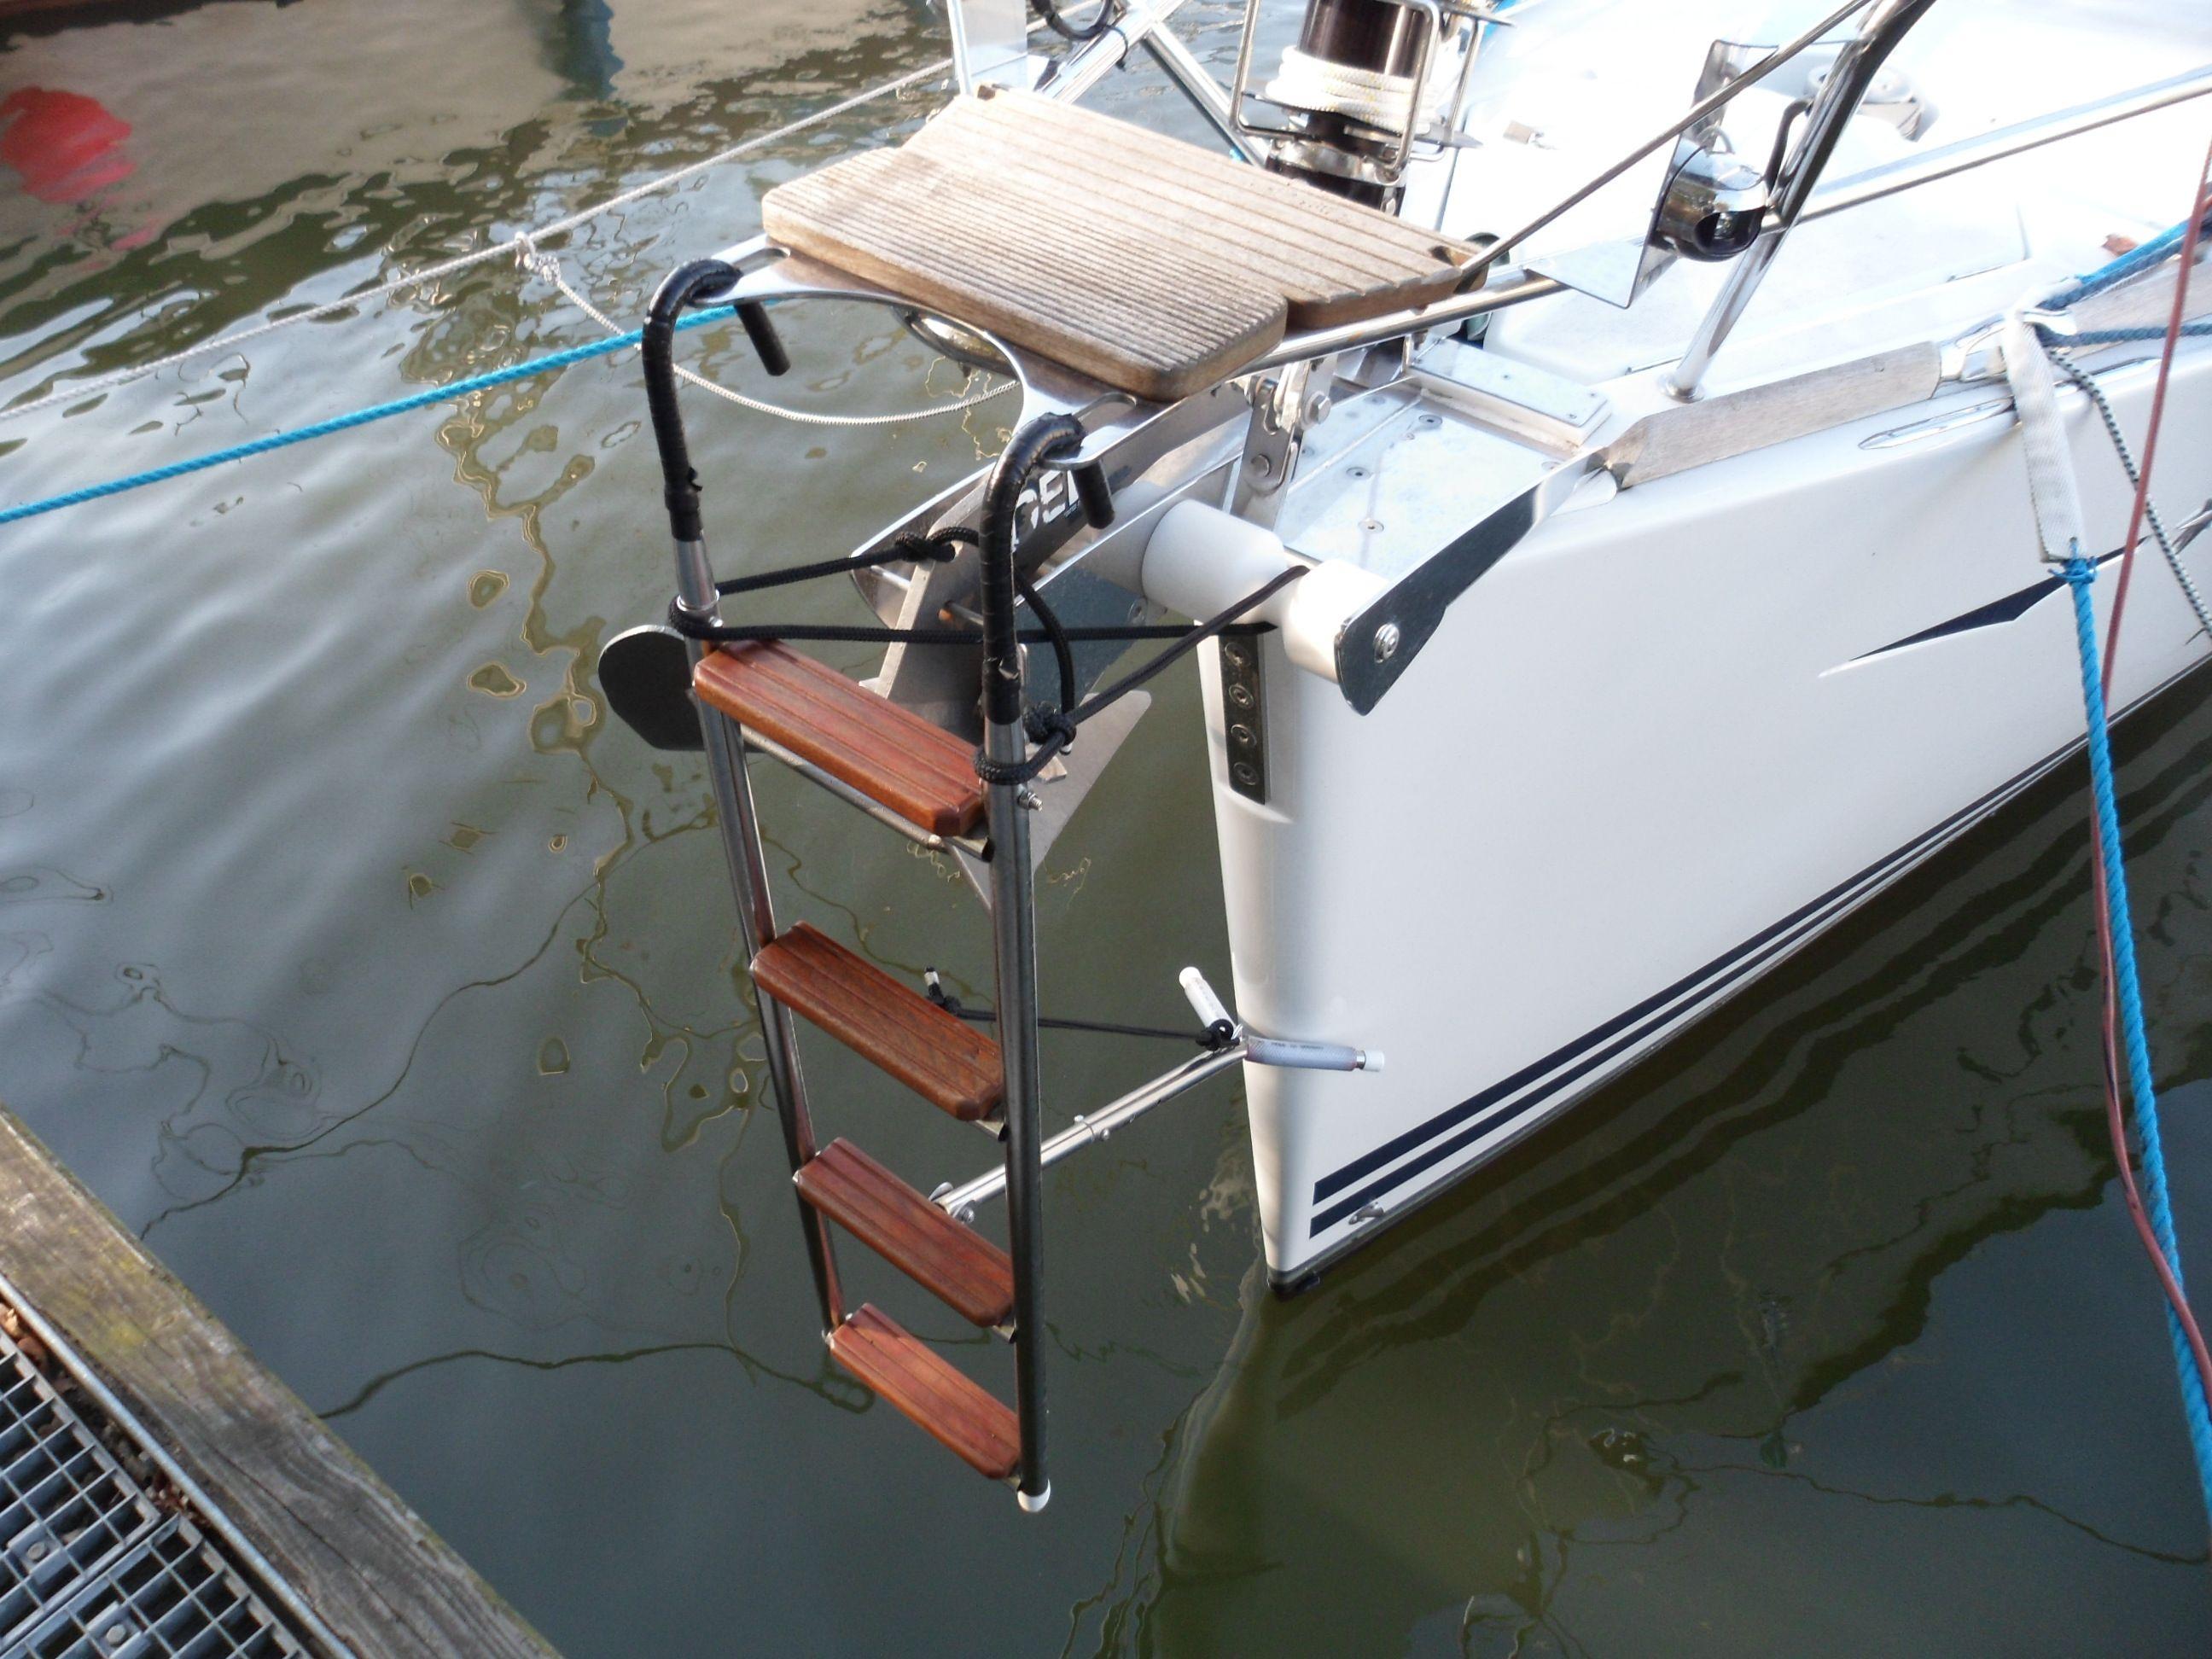 Gunwale Ladder For Sailboat Google Search Boat Stuff In 2018 Bilge Pump Float Switch 3rd Wire Sailnet Community